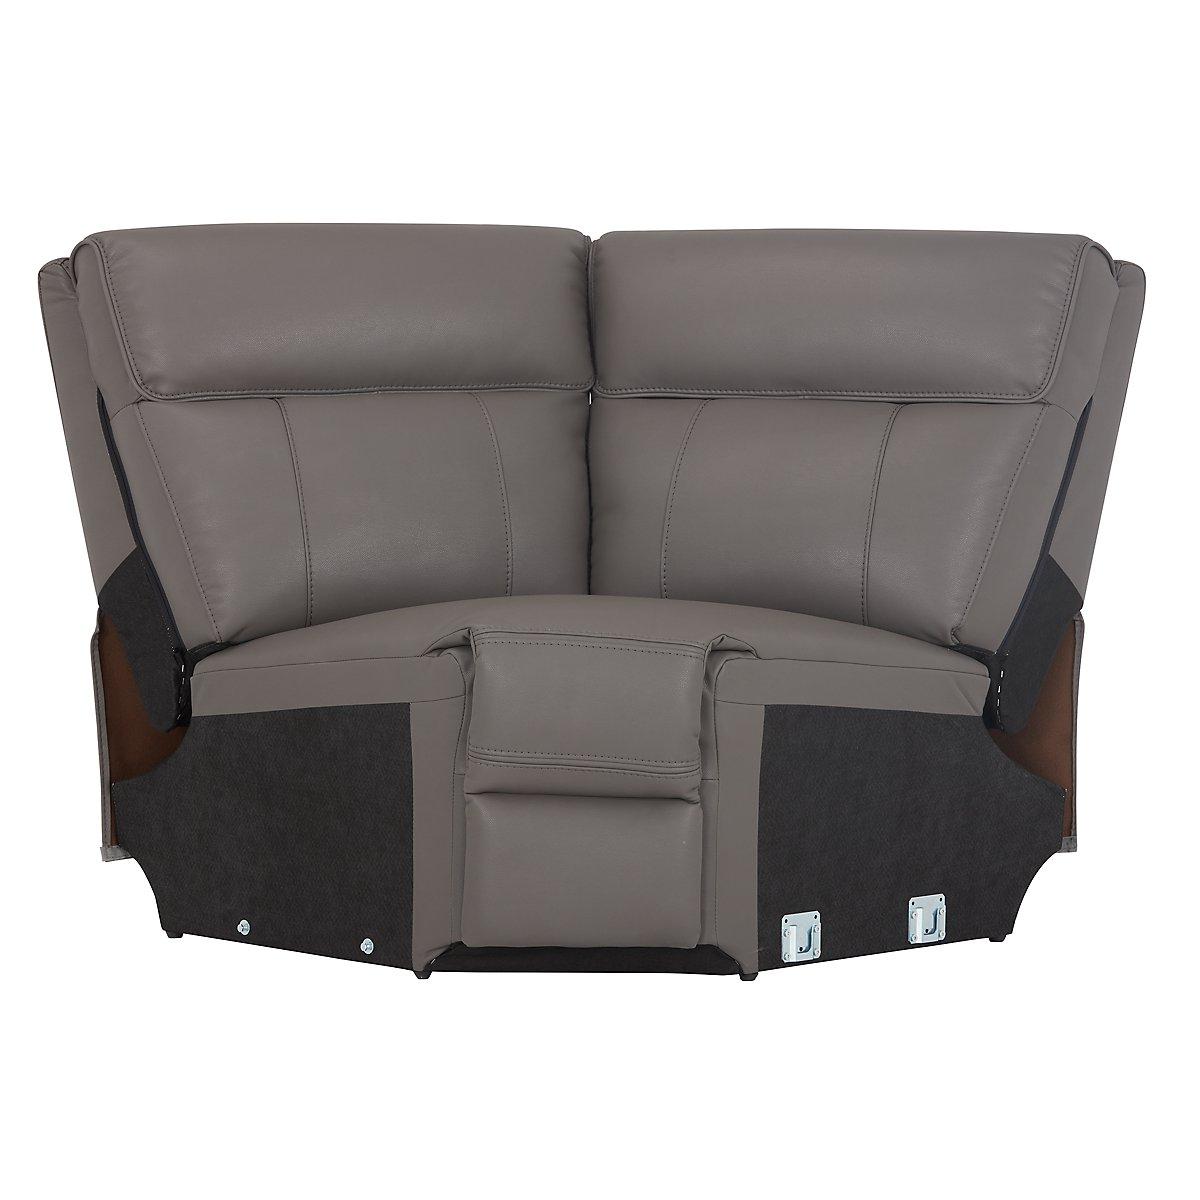 City Furniture Rhett Gray Microfiber Small Two Arm Power